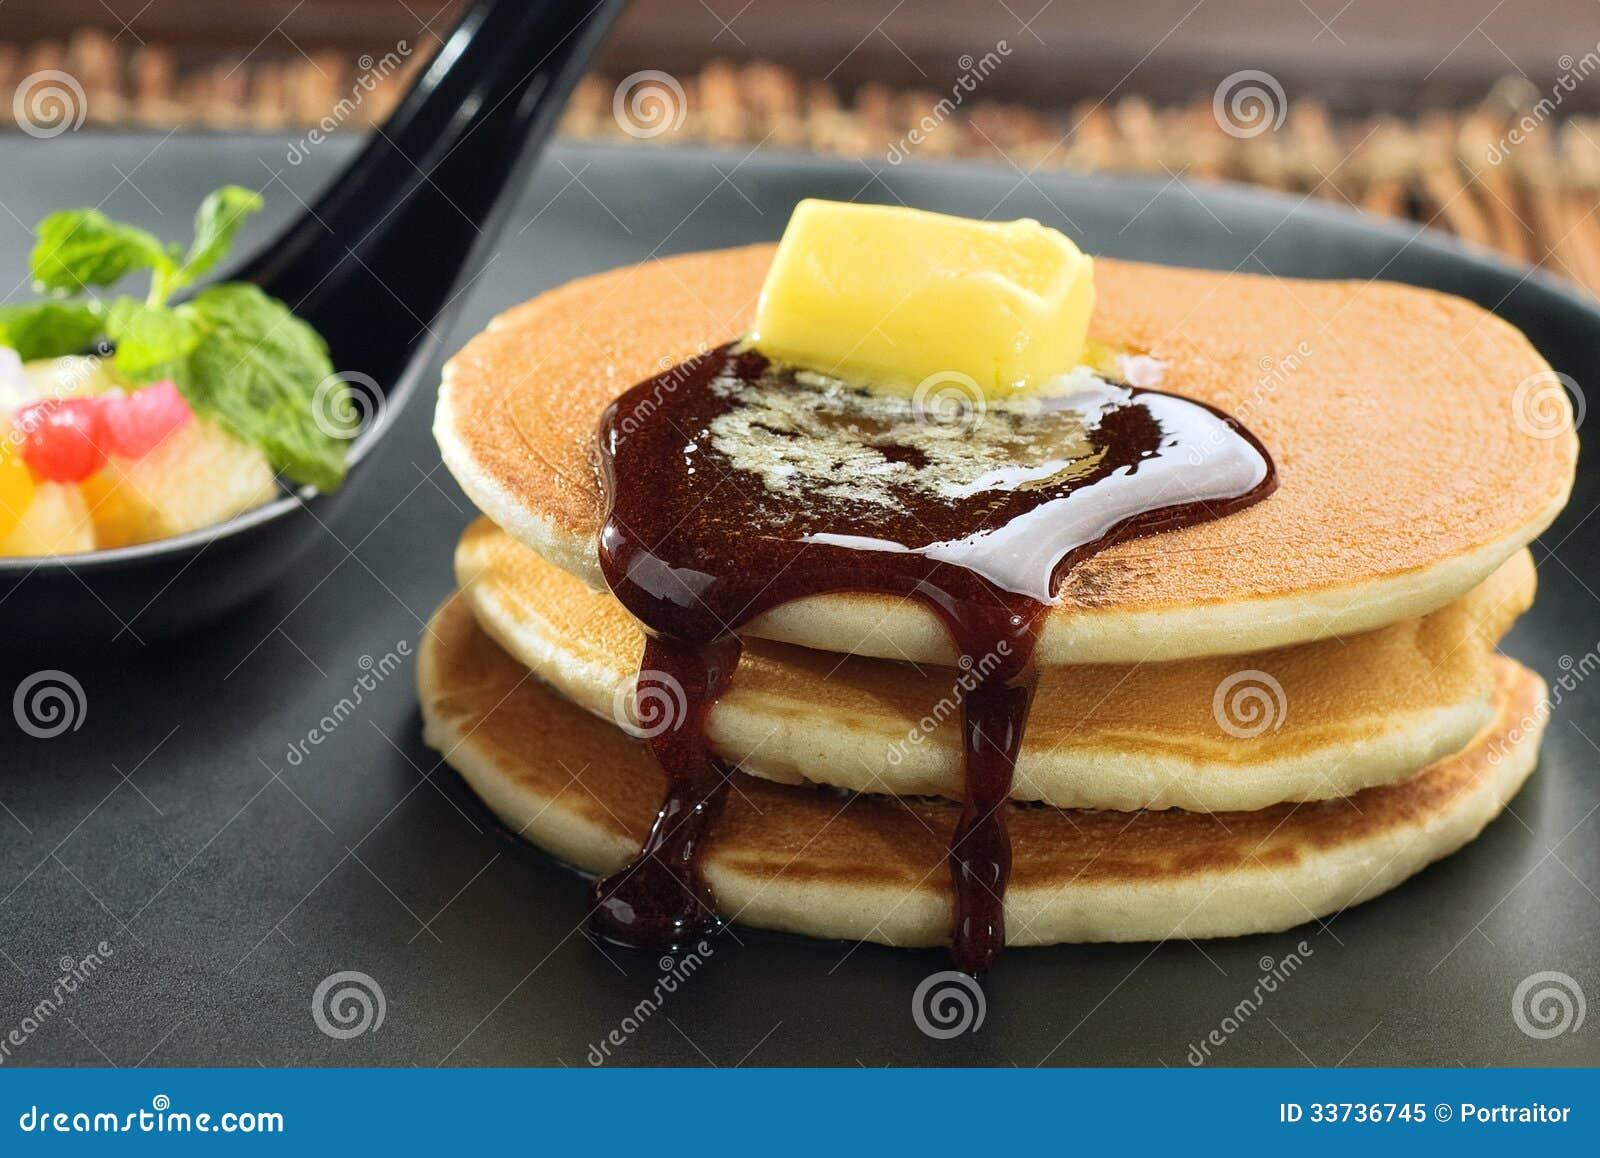 Blin z miodem i masłem